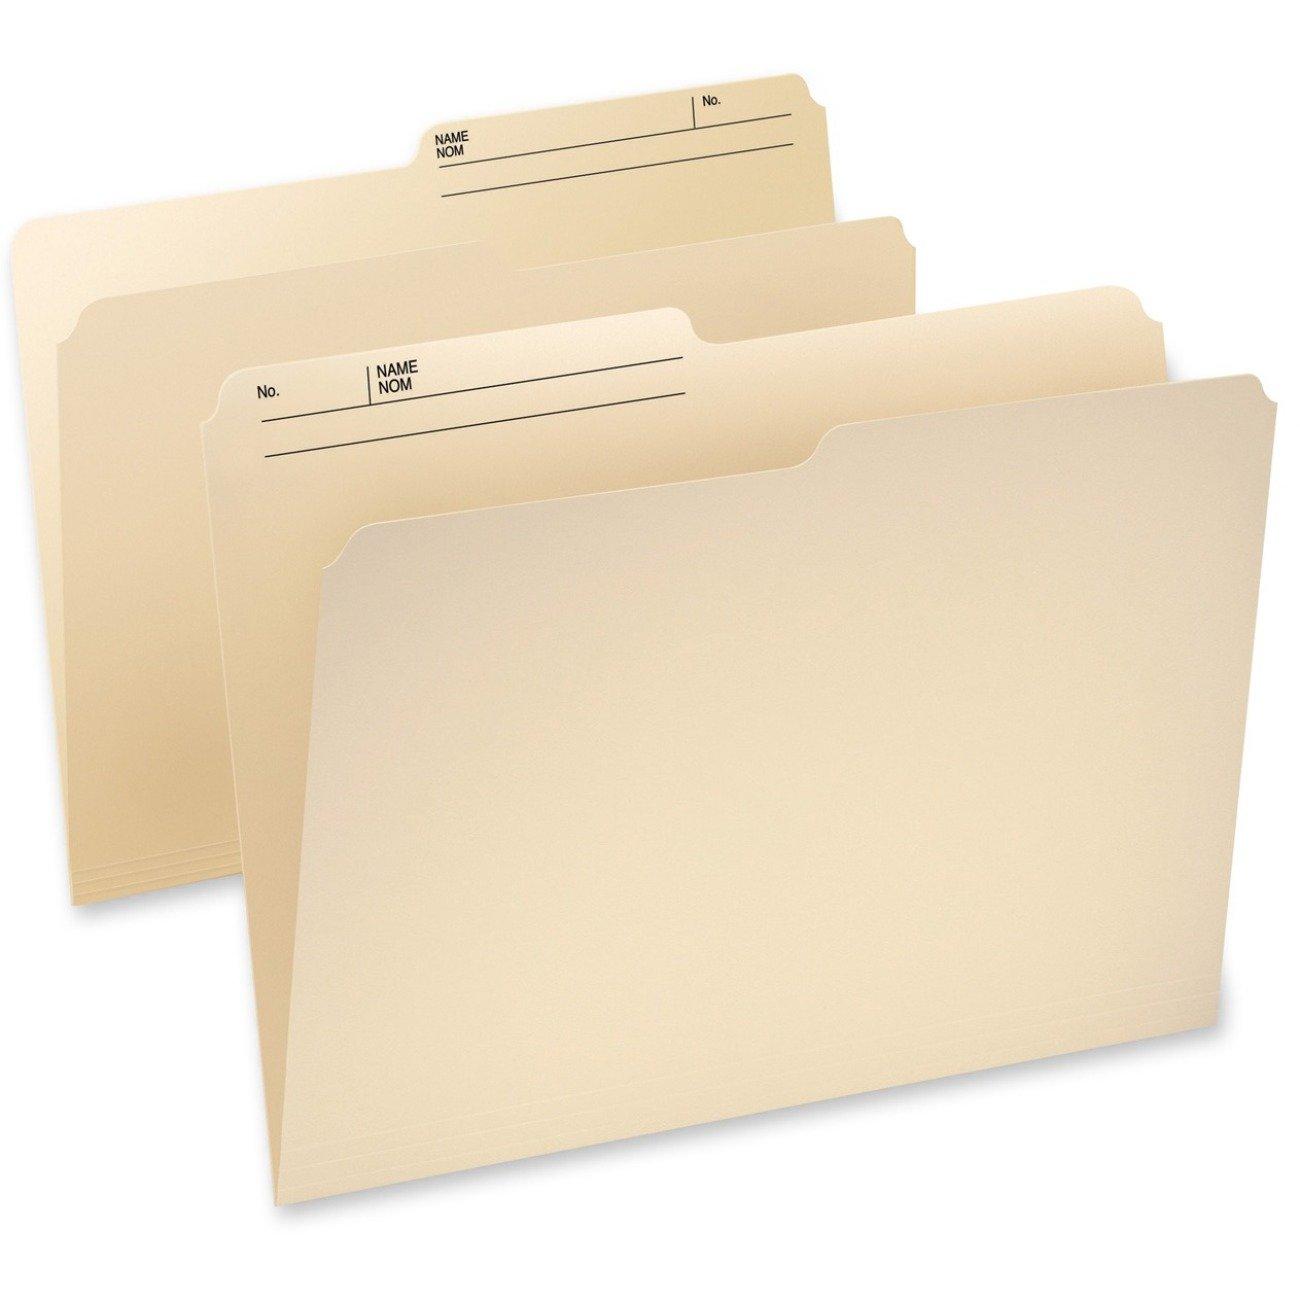 Pendaflex Cutless Watershed Top Tab File Folder - Manilla - Legal - 100/Box